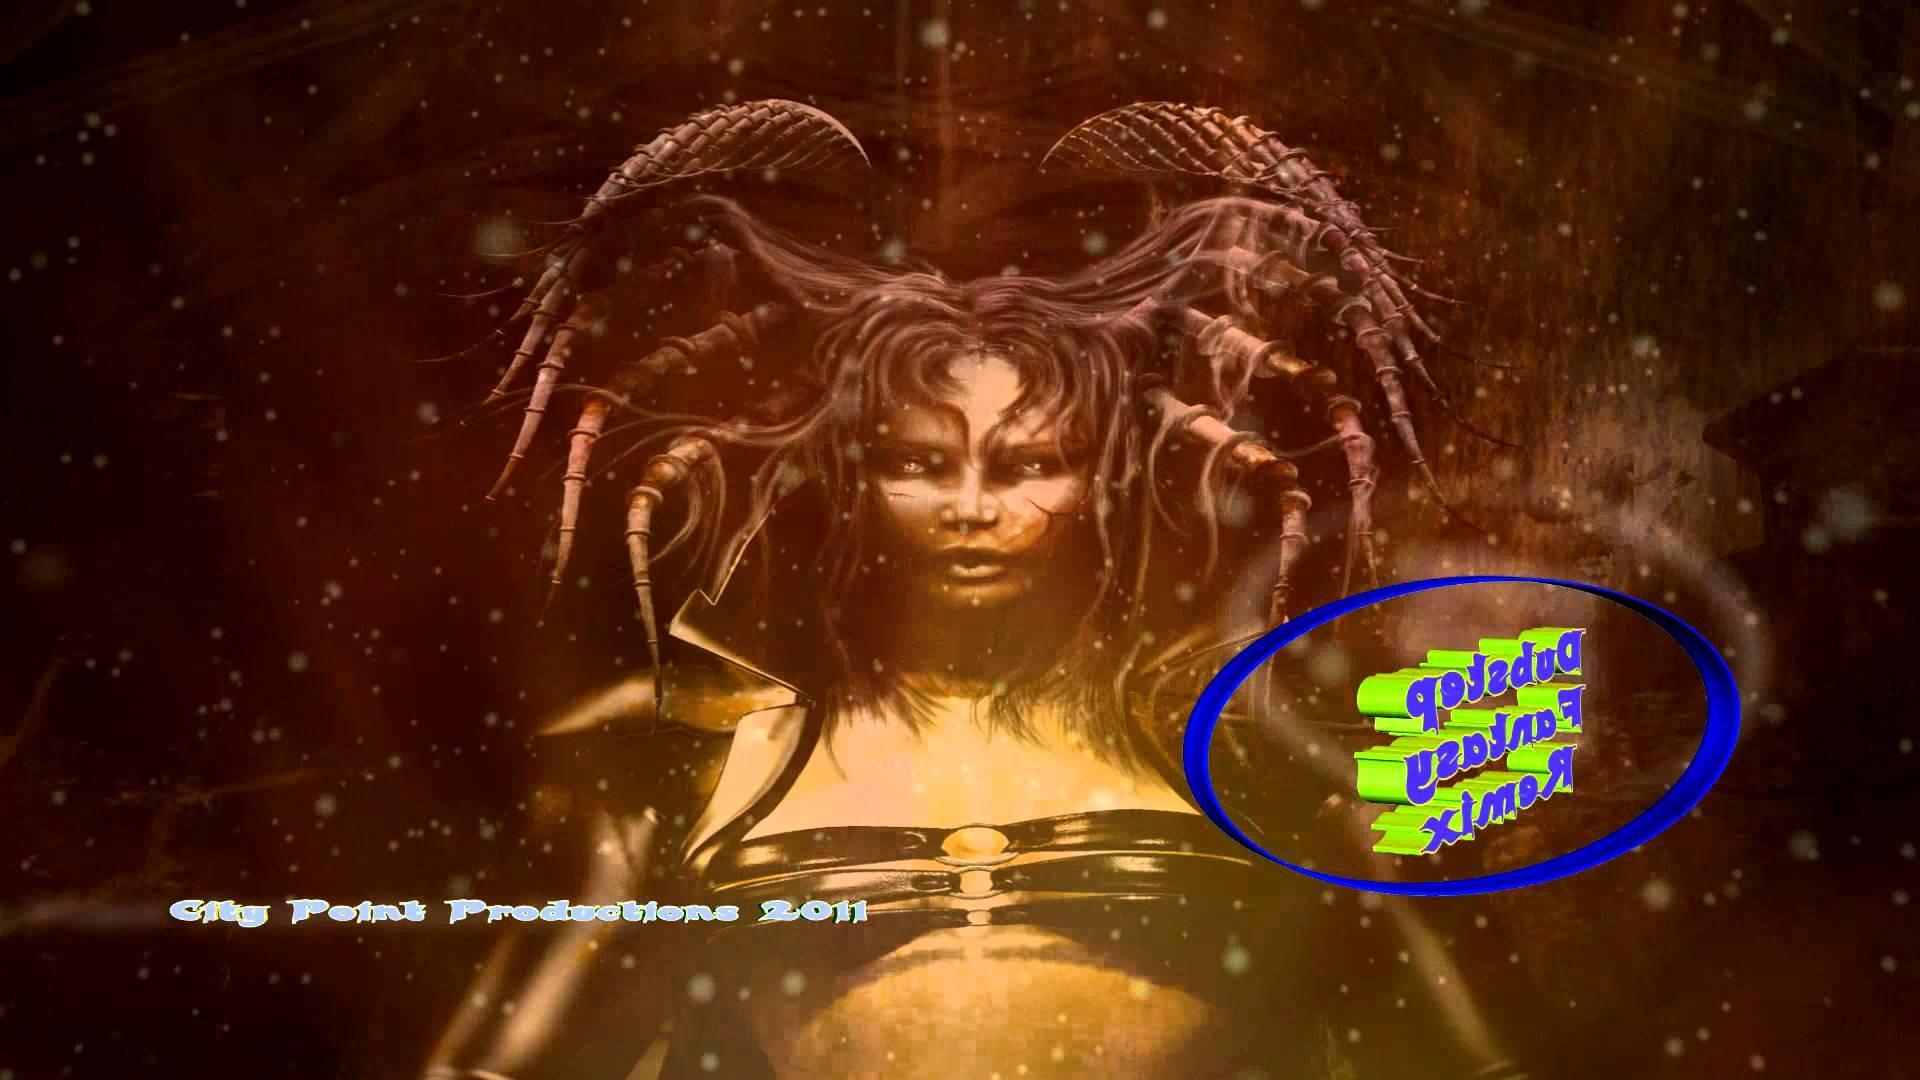 Res: 1920x1080, Dubstep Fantasy Remix - Sexy Female Demon HD Wallpaper